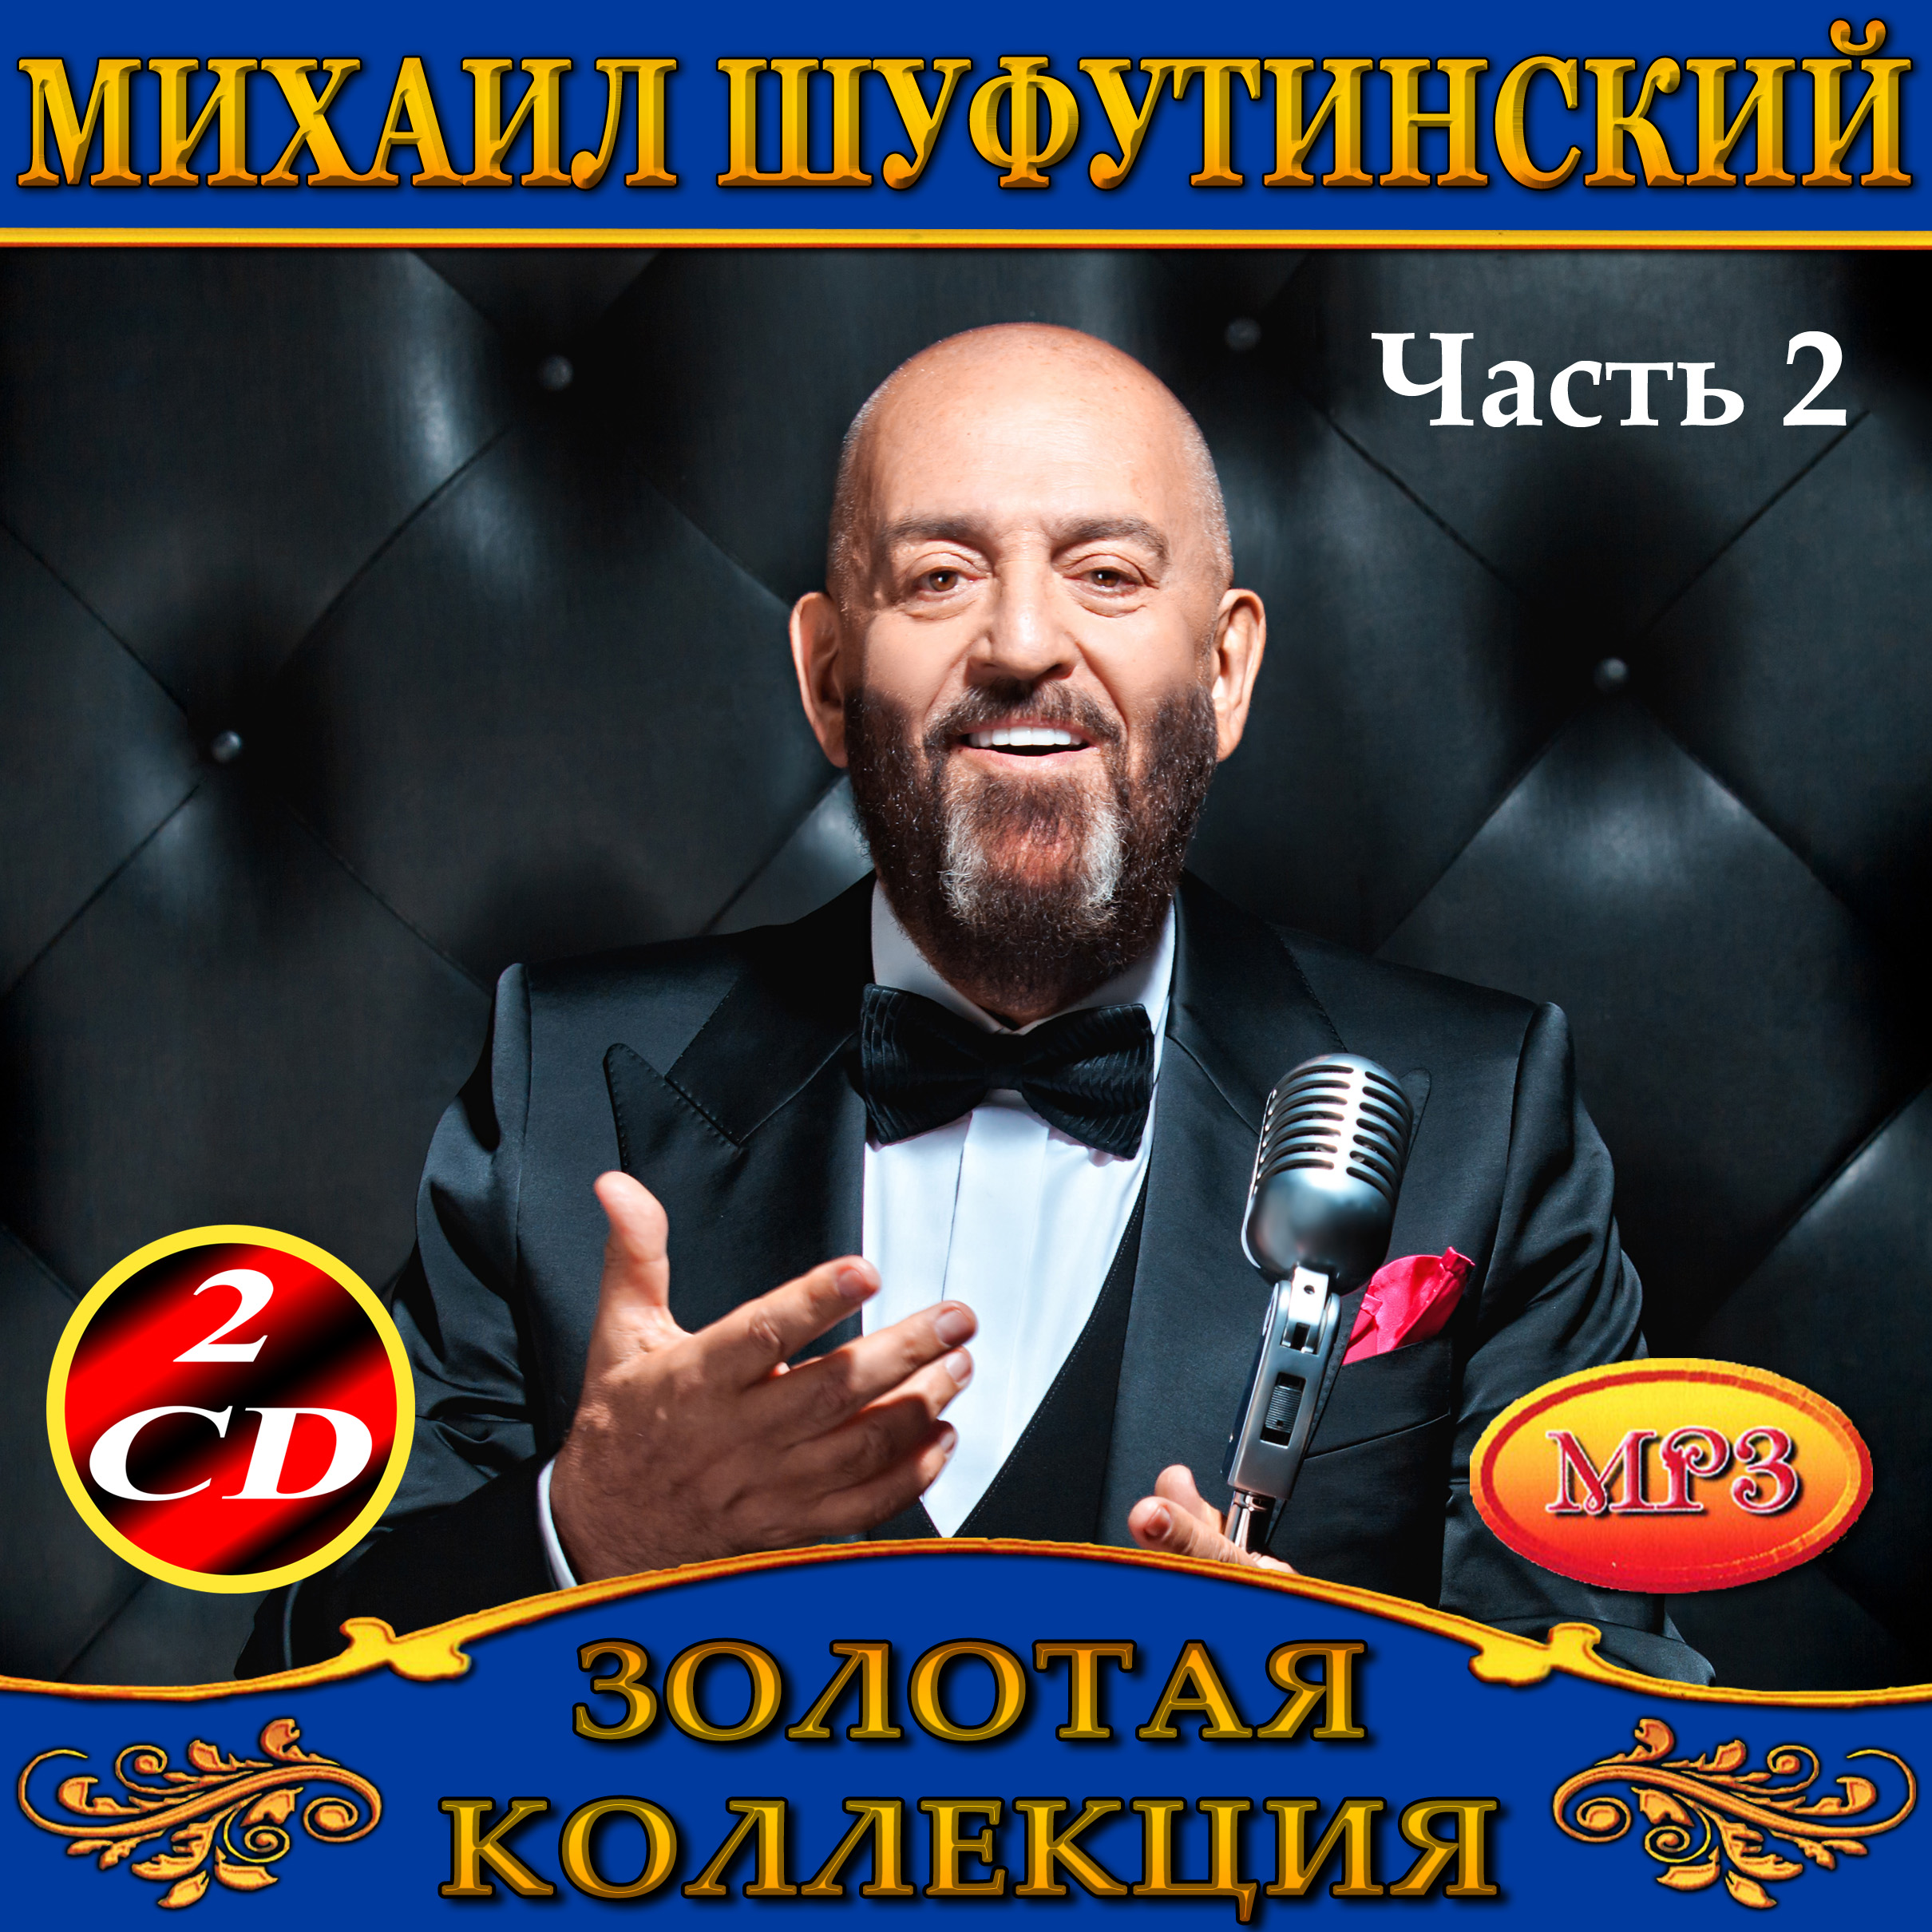 Михаил Шуфутинский 2ч2cd [mp3]